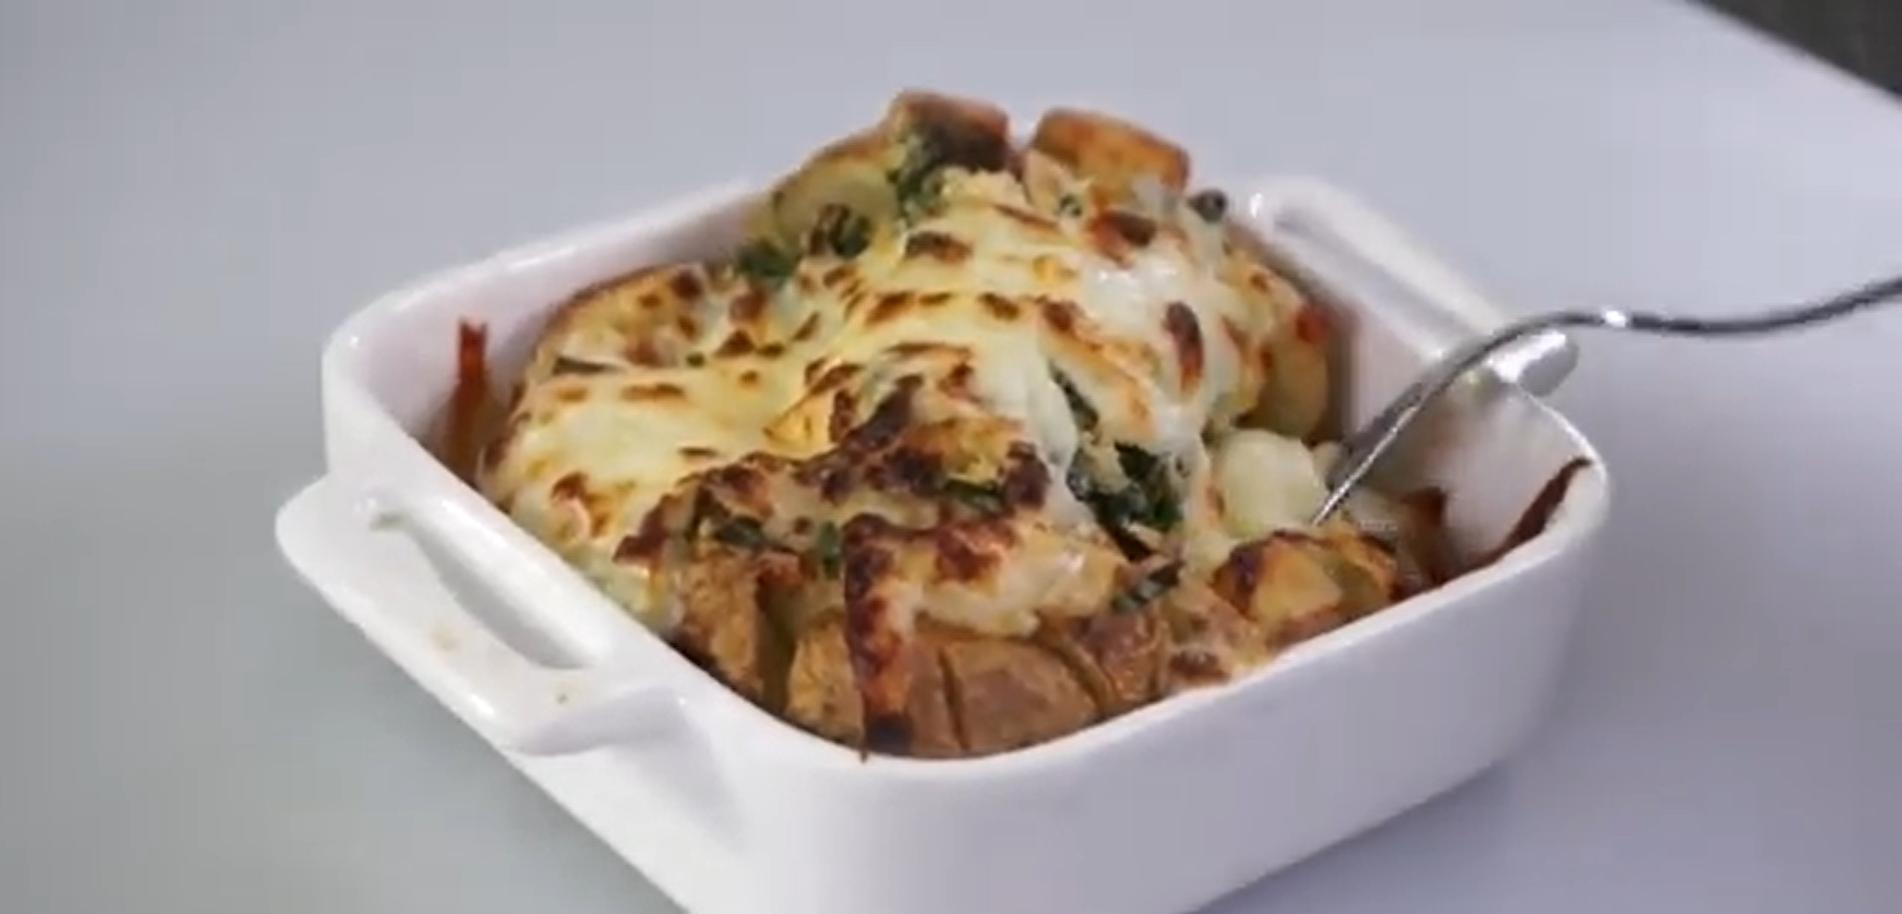 A #DexterDelicious Bloomin' Loaded Baked Potato Recipe